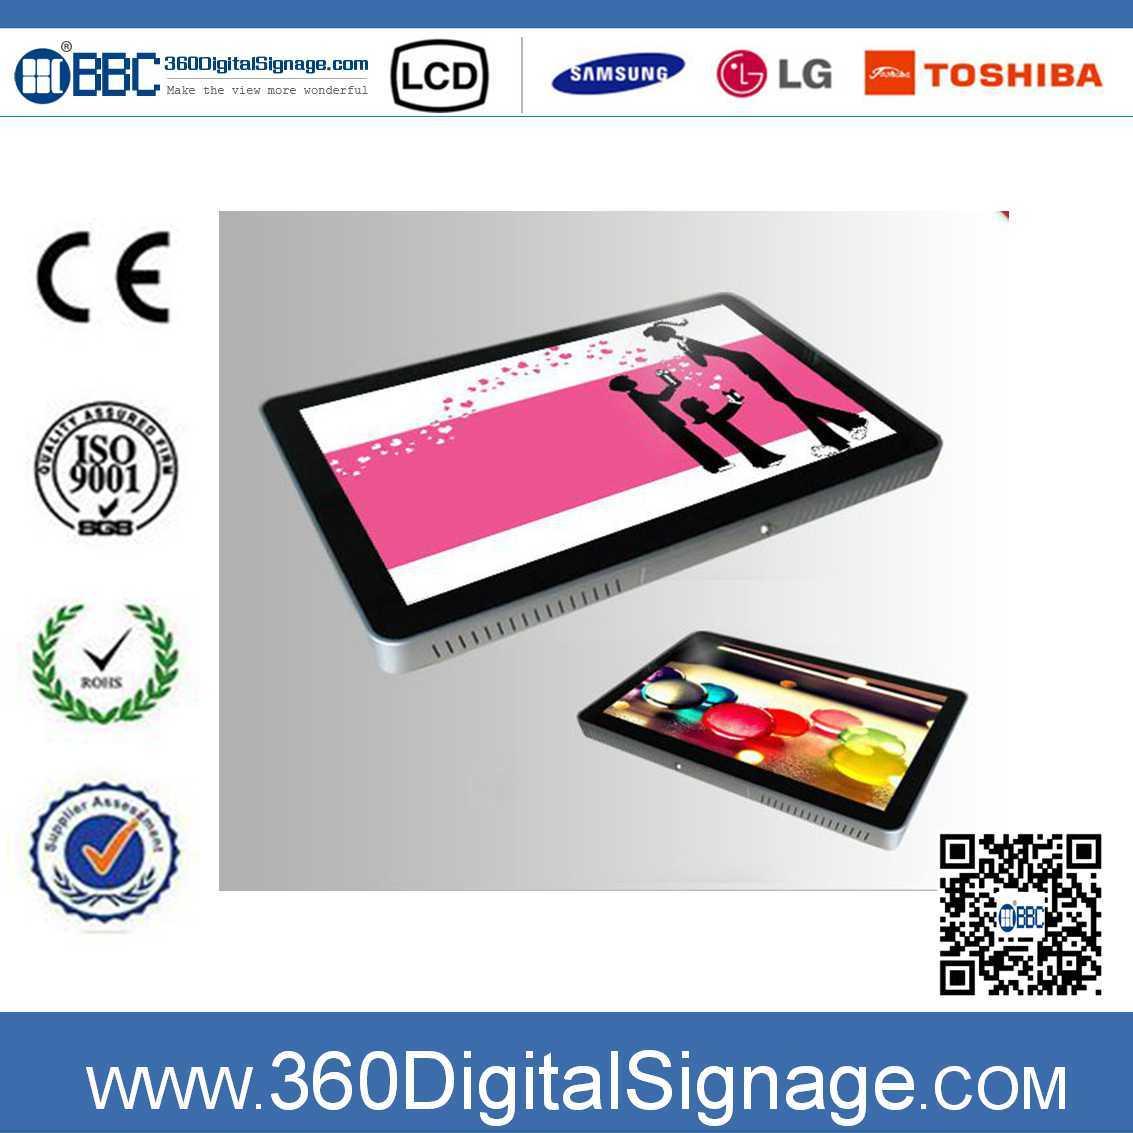 42inch Soem Wall Hanging LCD Display Advertizing